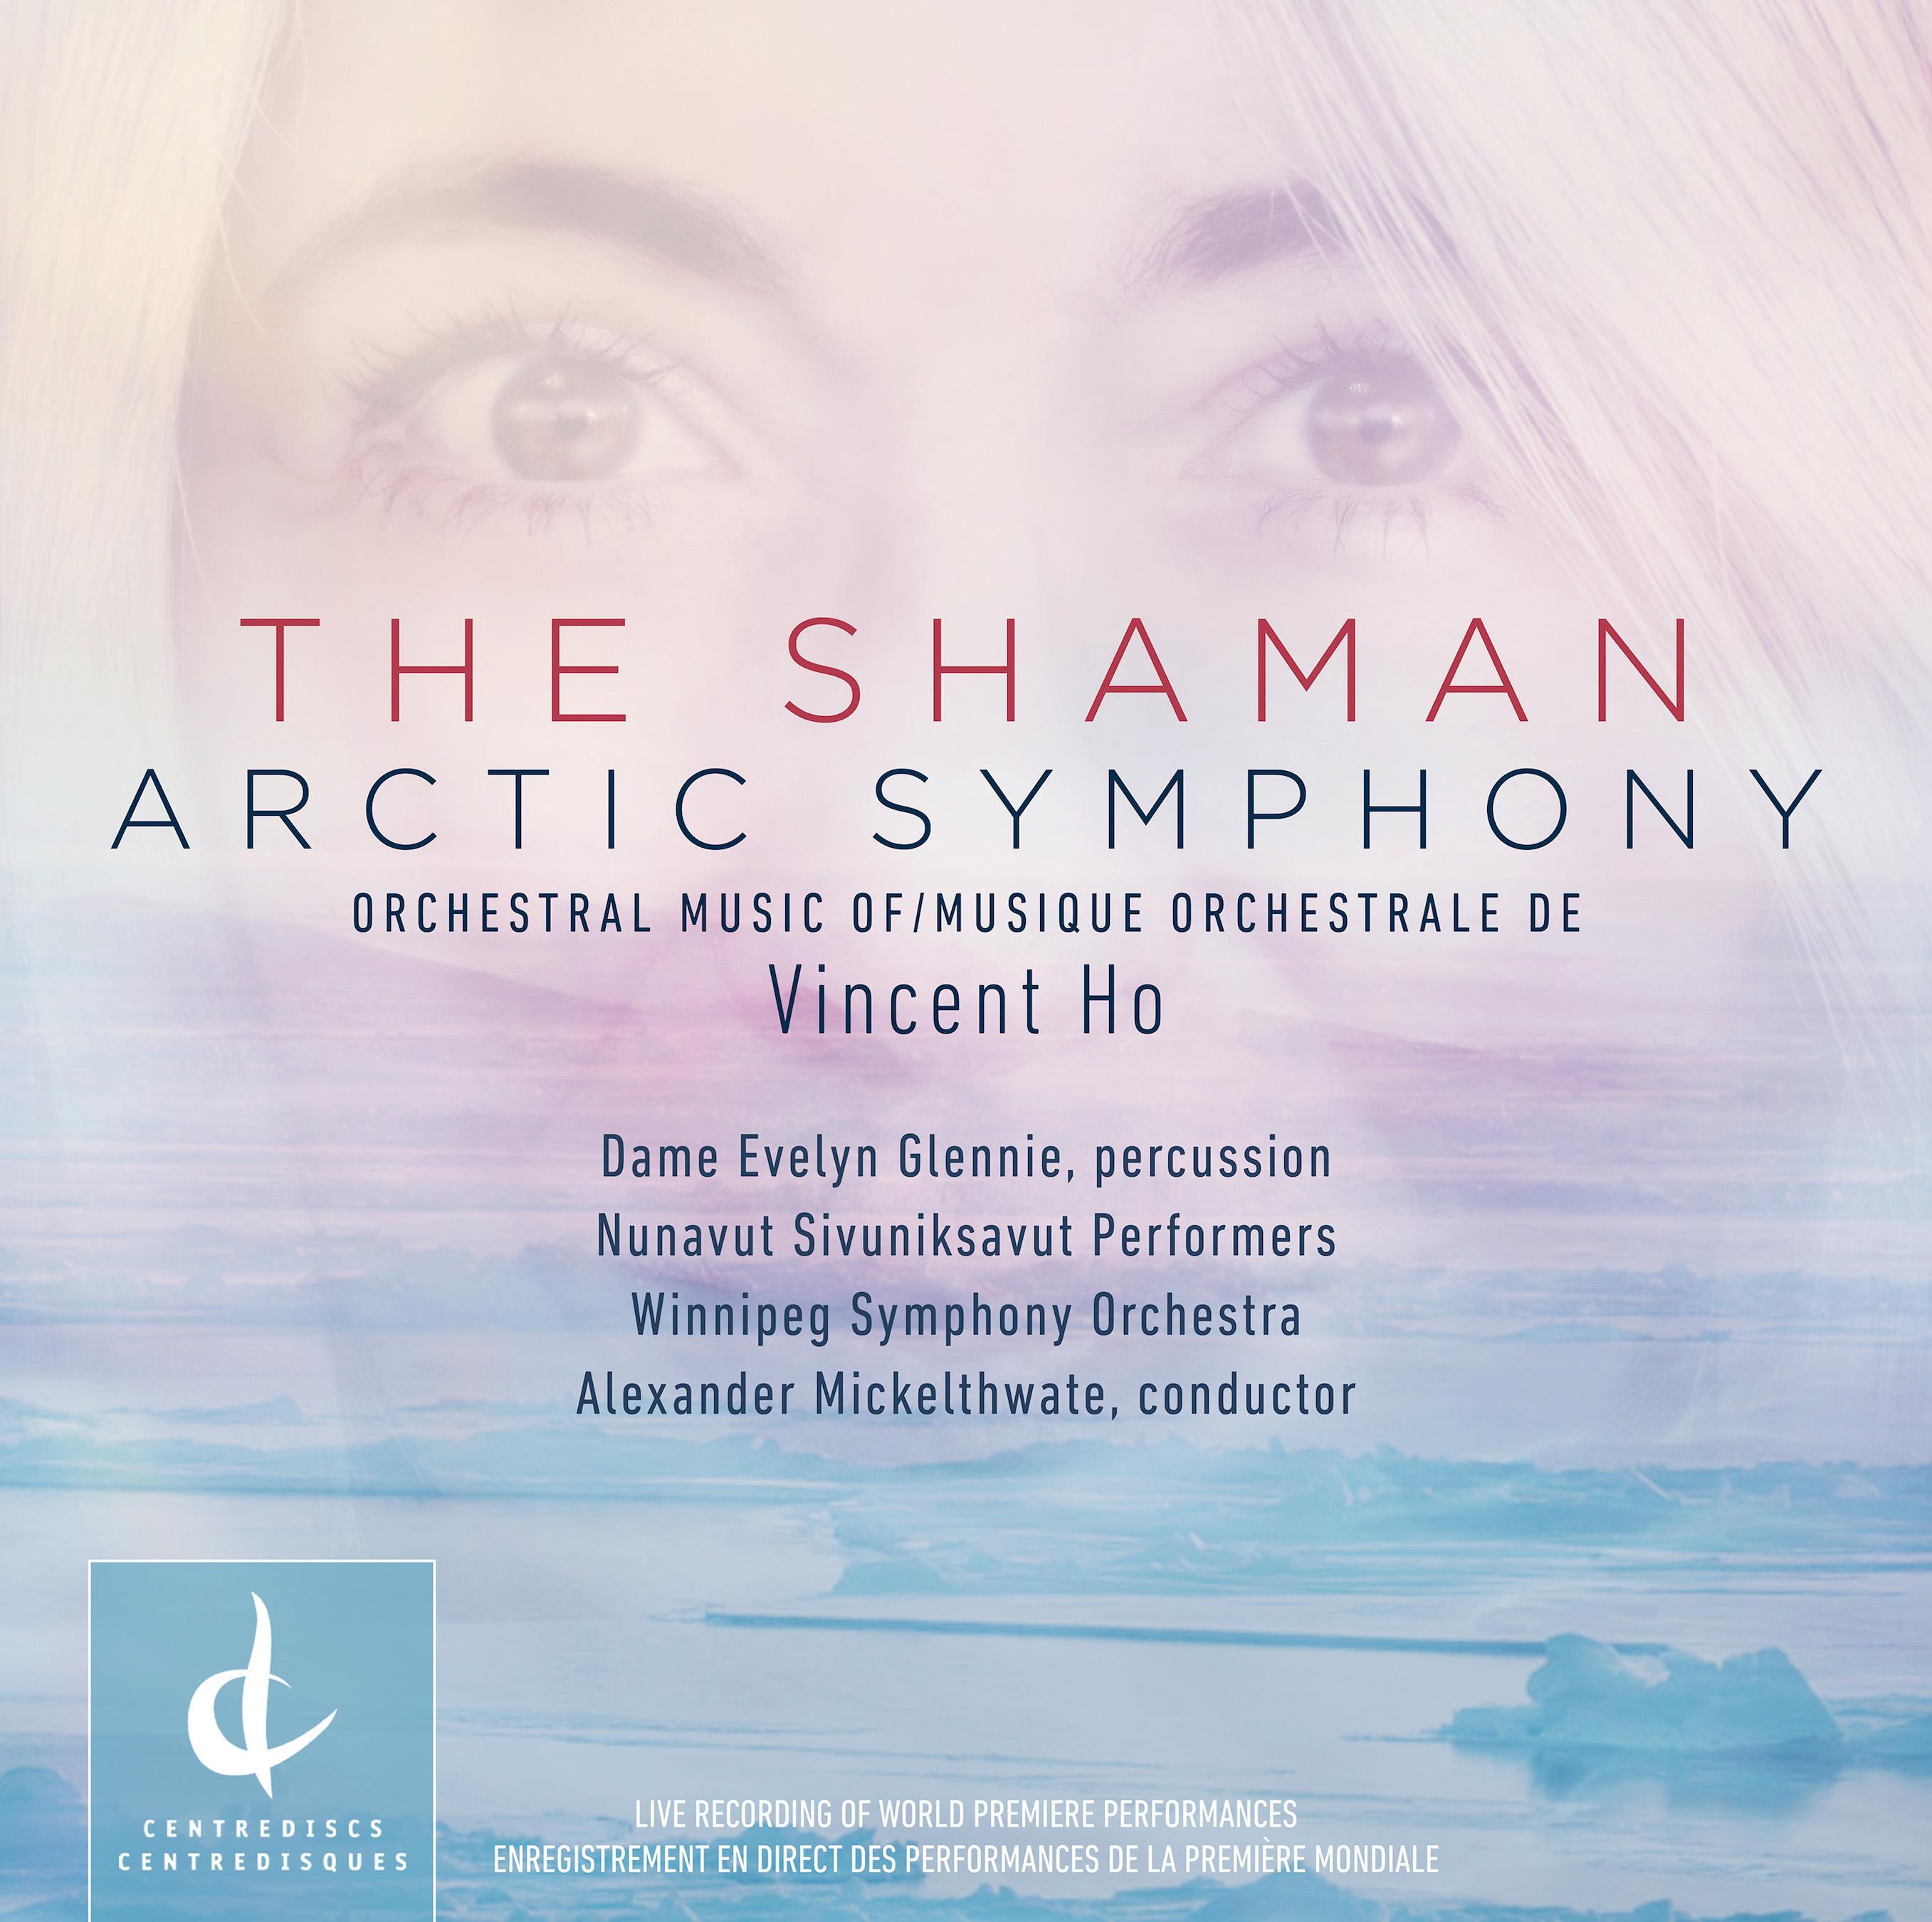 The Shaman; Arctic Symphony – 2018 Juno Nominee; Classical Album of the Year, Large Ensemble, 2018 WCMA winner, Classical Artist/Ensemble of the Year